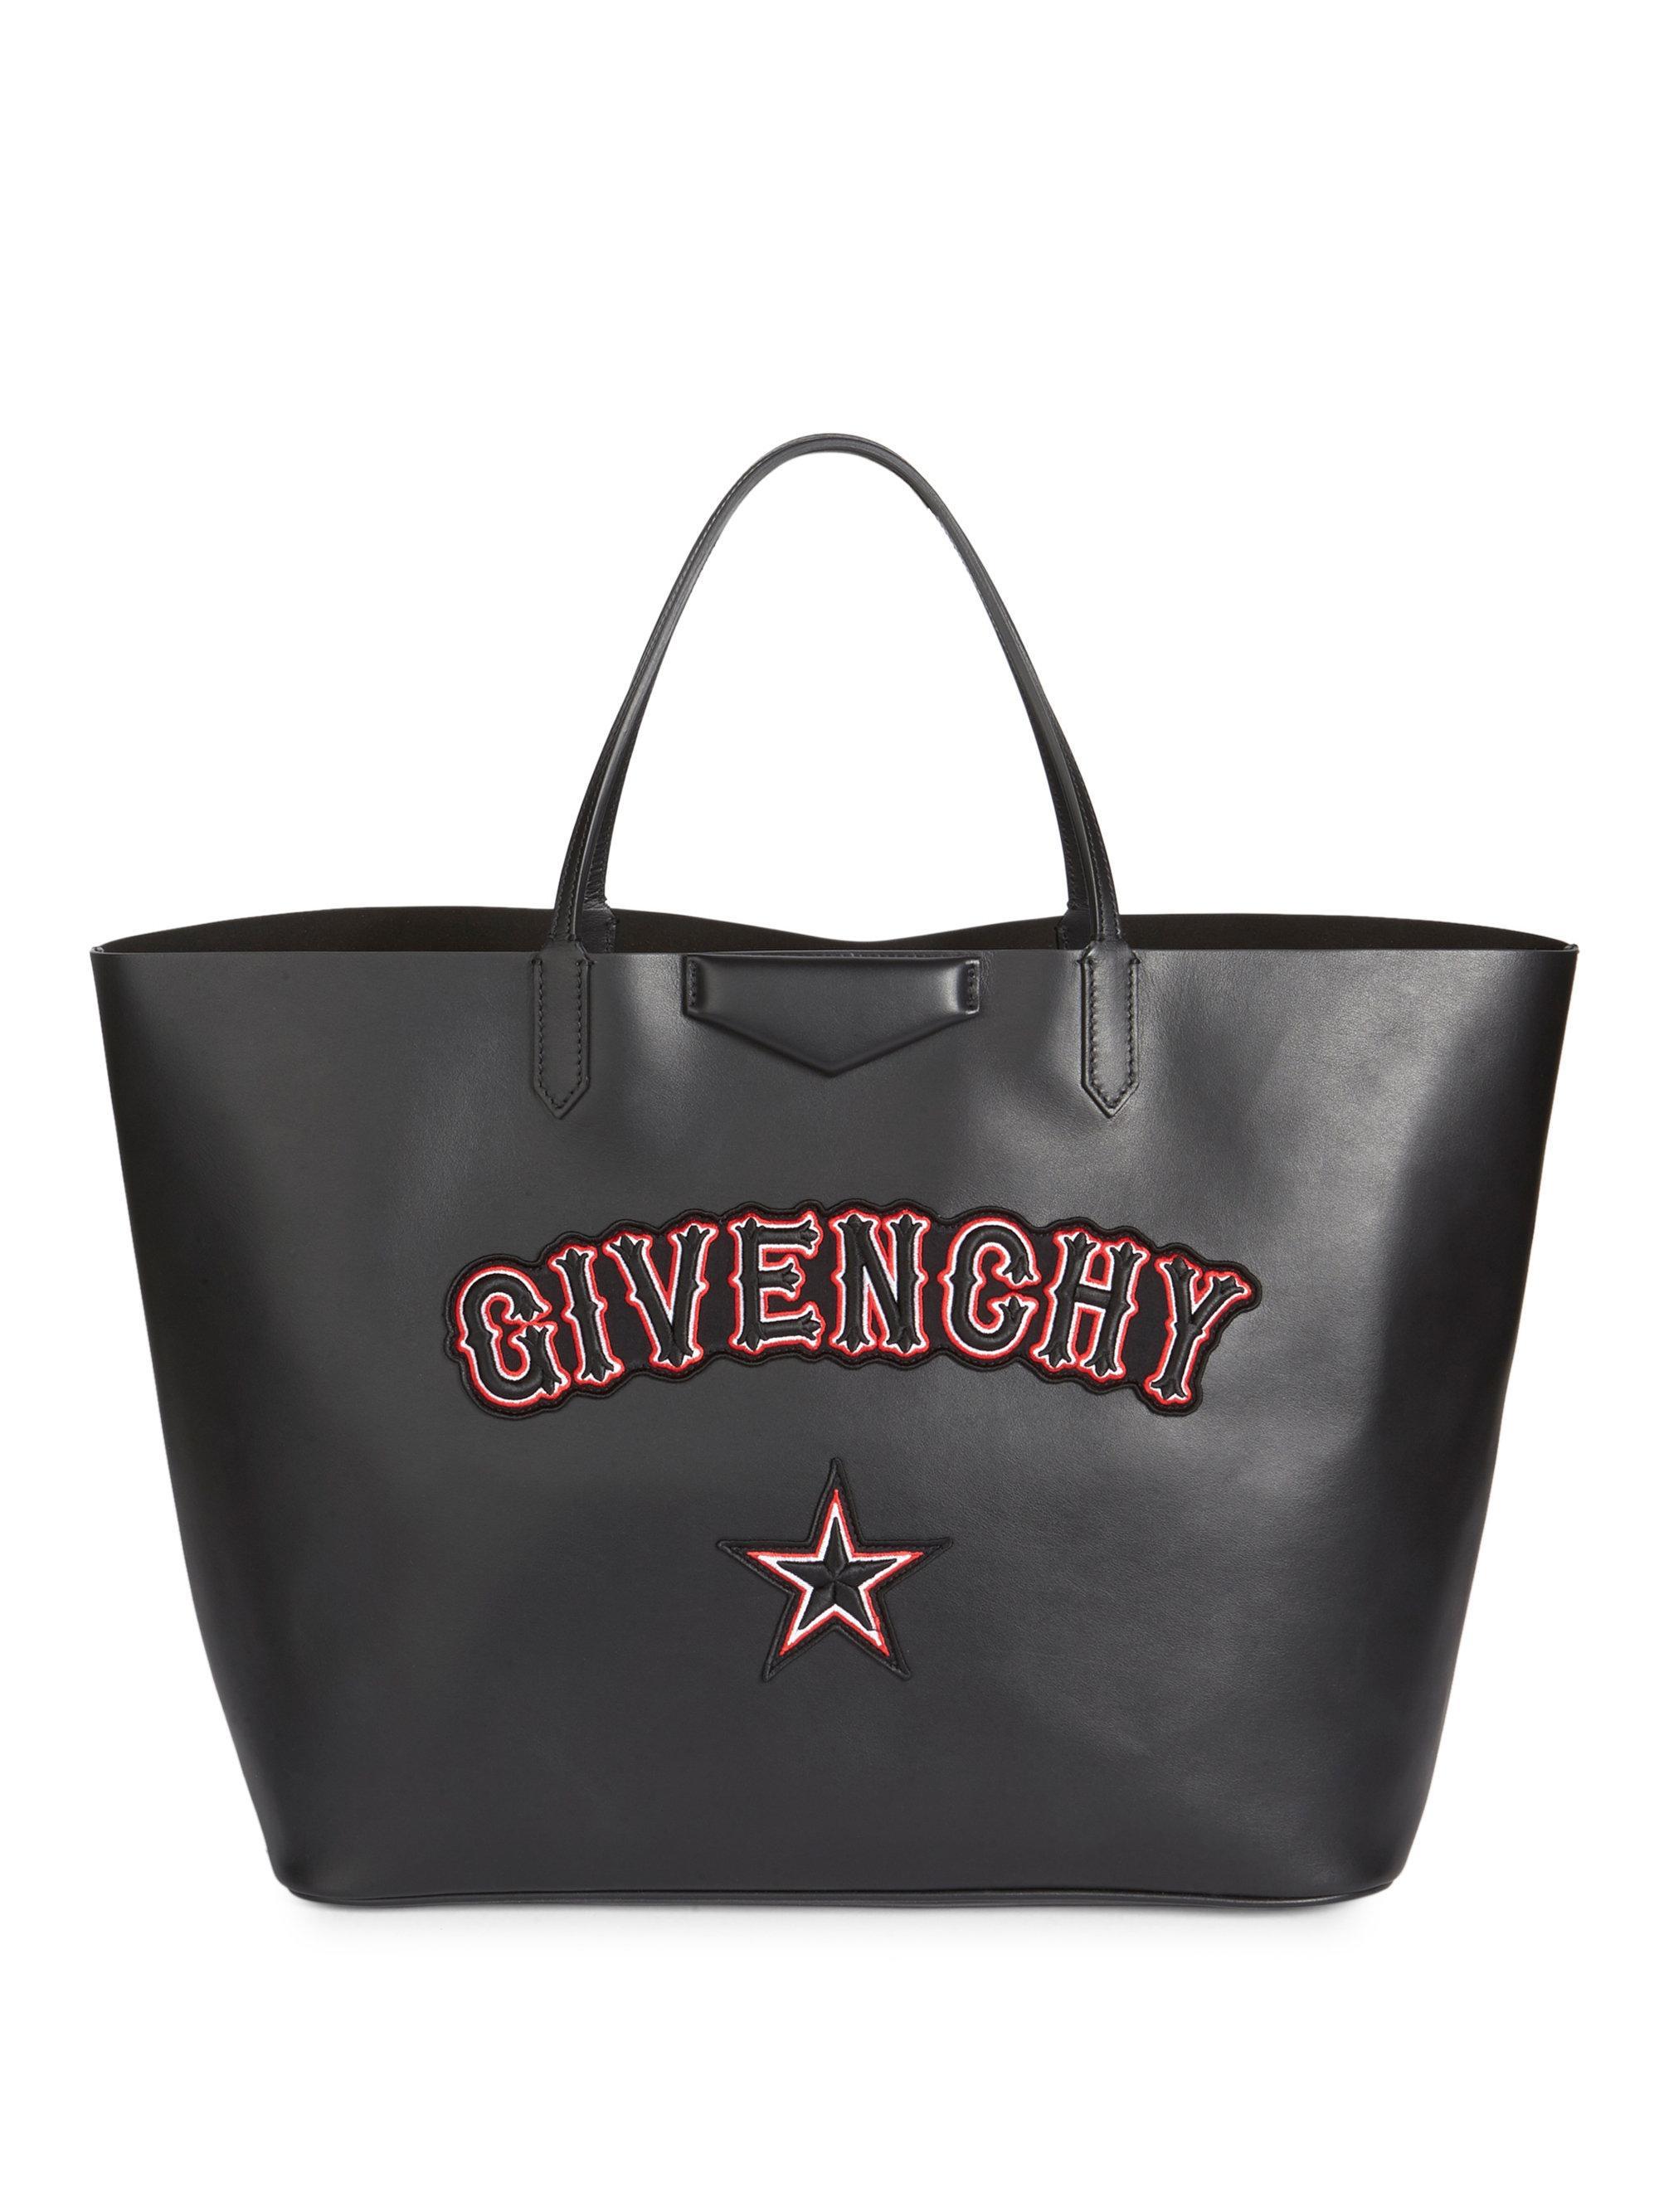 Lyst - Givenchy Antigona Large Gothic Logo Shopper in Black a04f40e988462